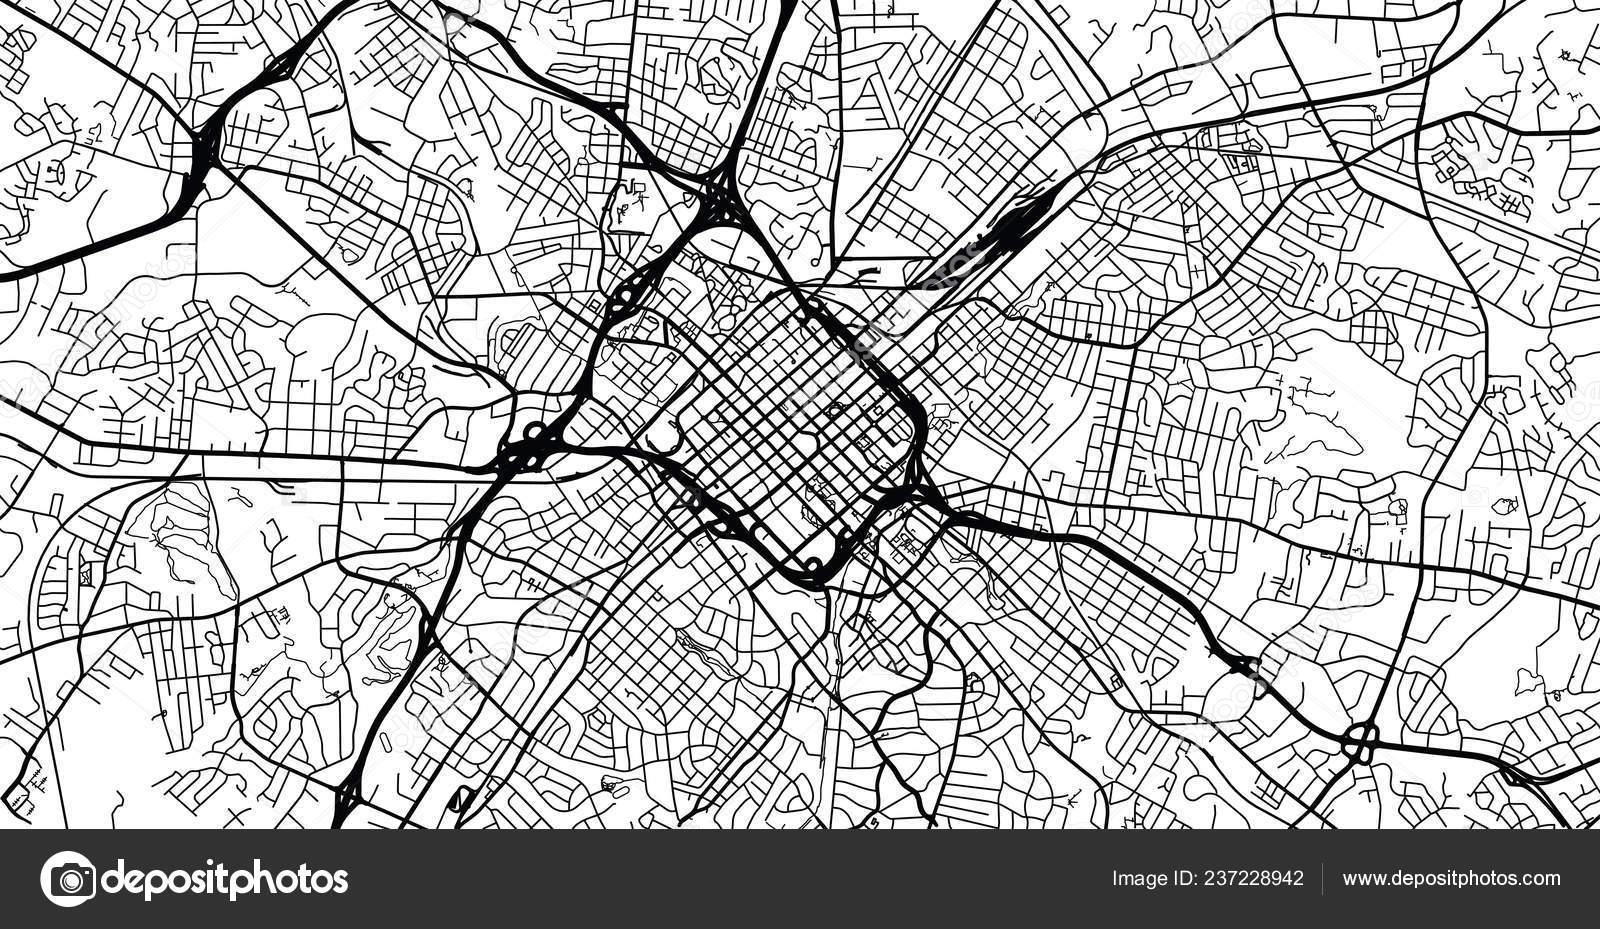 Urban Vector City Map Charlotte North Carolina United States America - Us-map-charlotte-nc